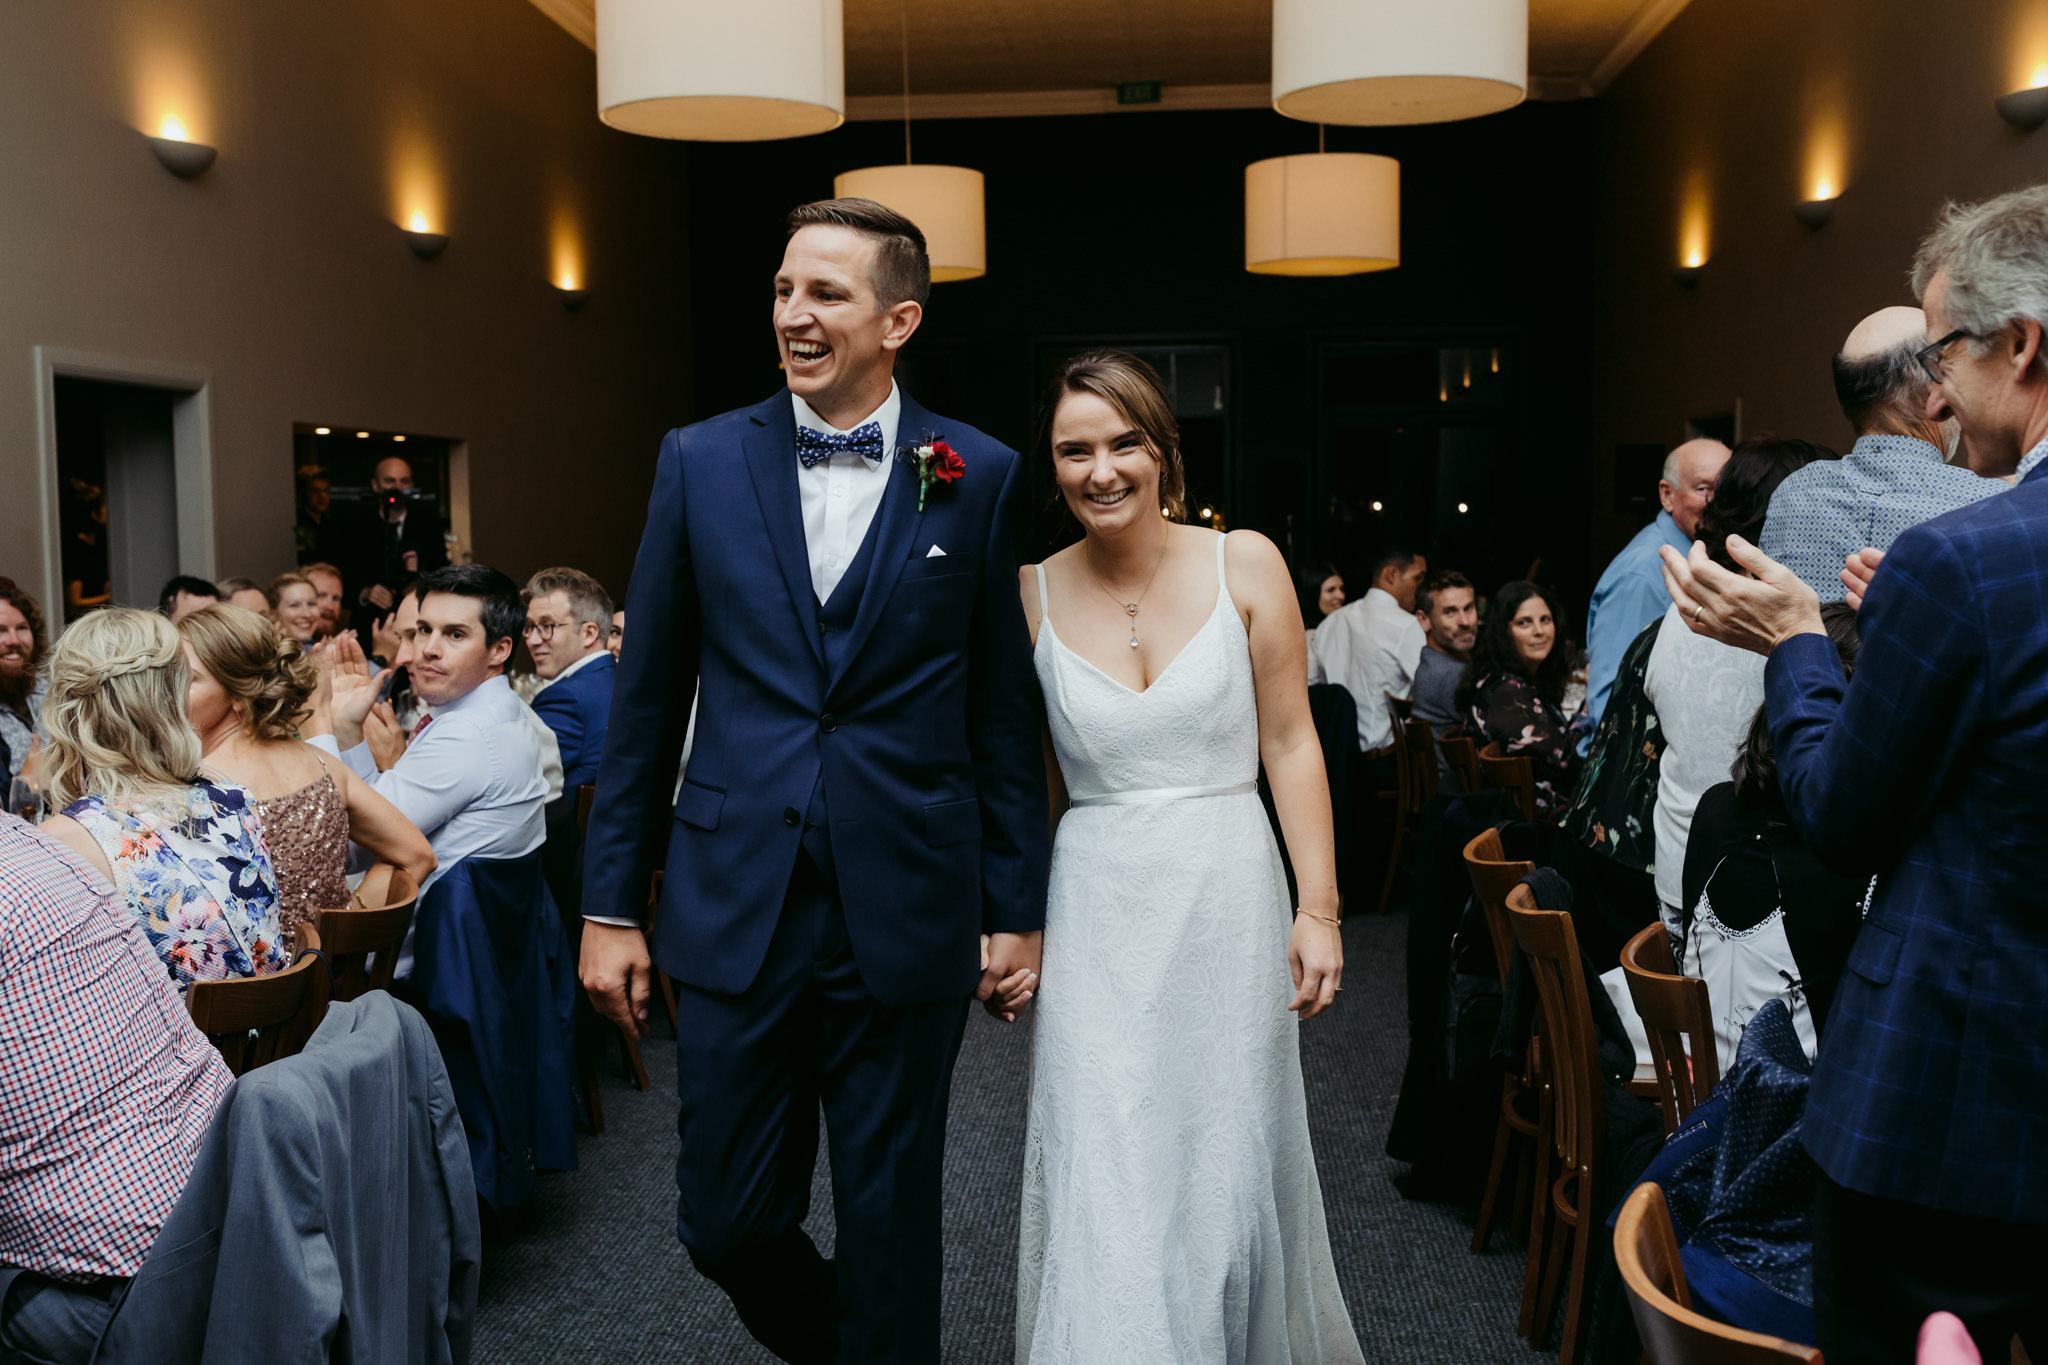 Erin Latimore Mudgee Canberra Wedding Photographer ROSEBANK GUESTHOUSE OLD THEATRE TONIC MILLTHORPE_710.JPG